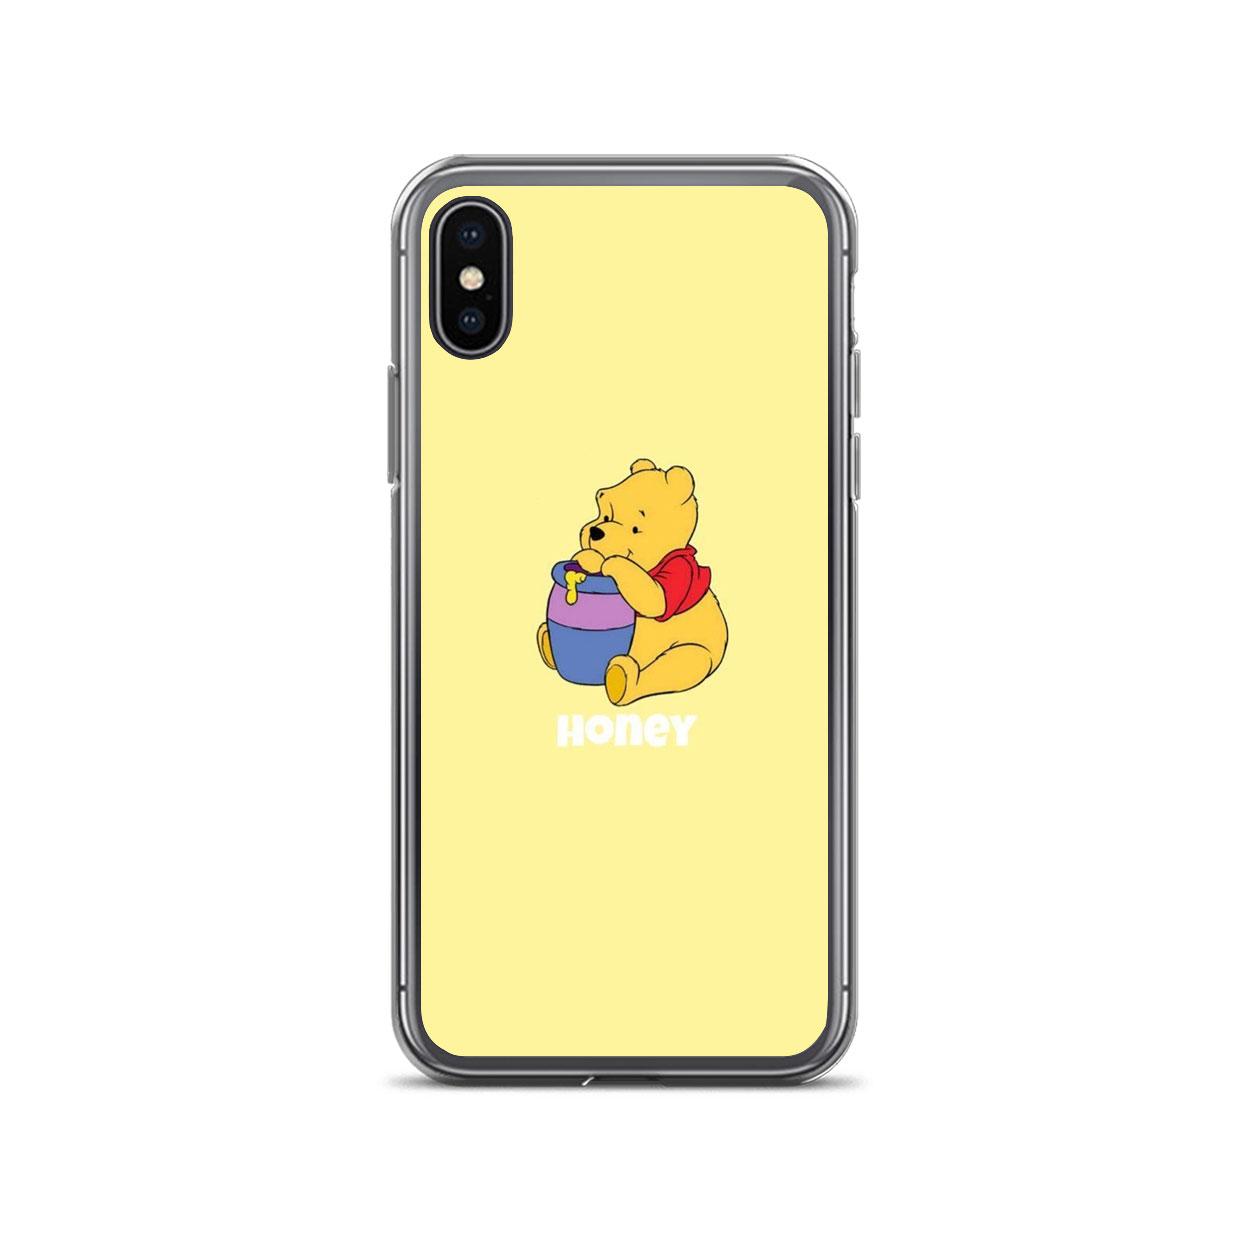 Honey Aesthetic Winnie The Pooh iPhone Case